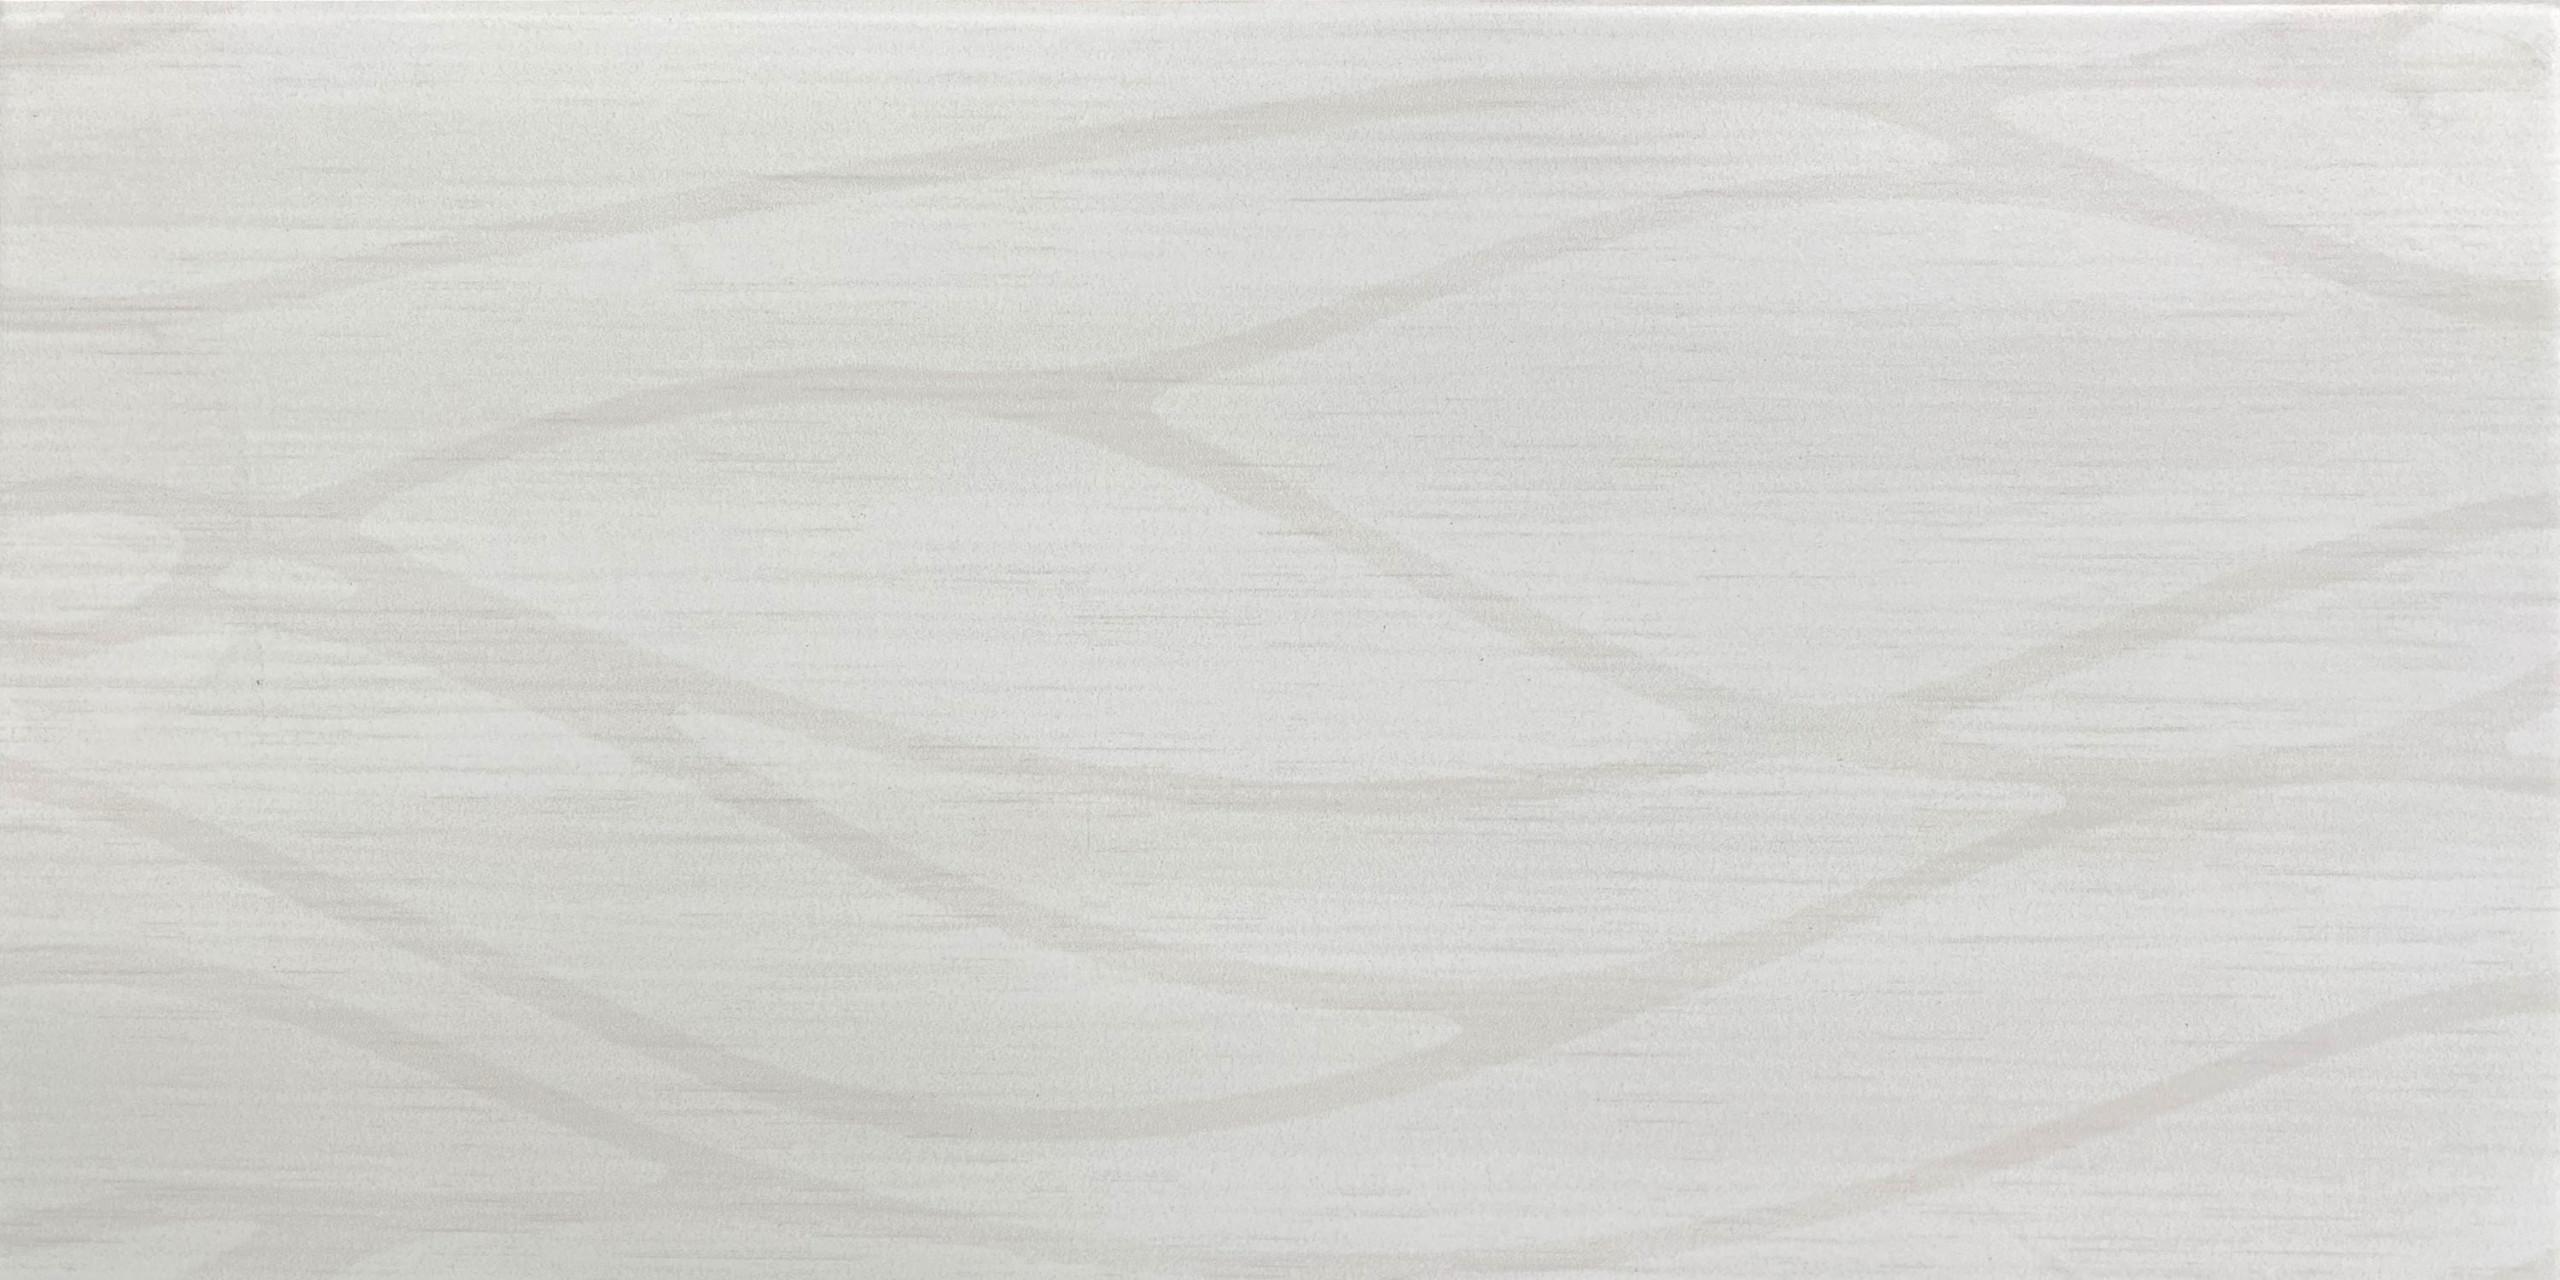 MELT Volldekor grau Image